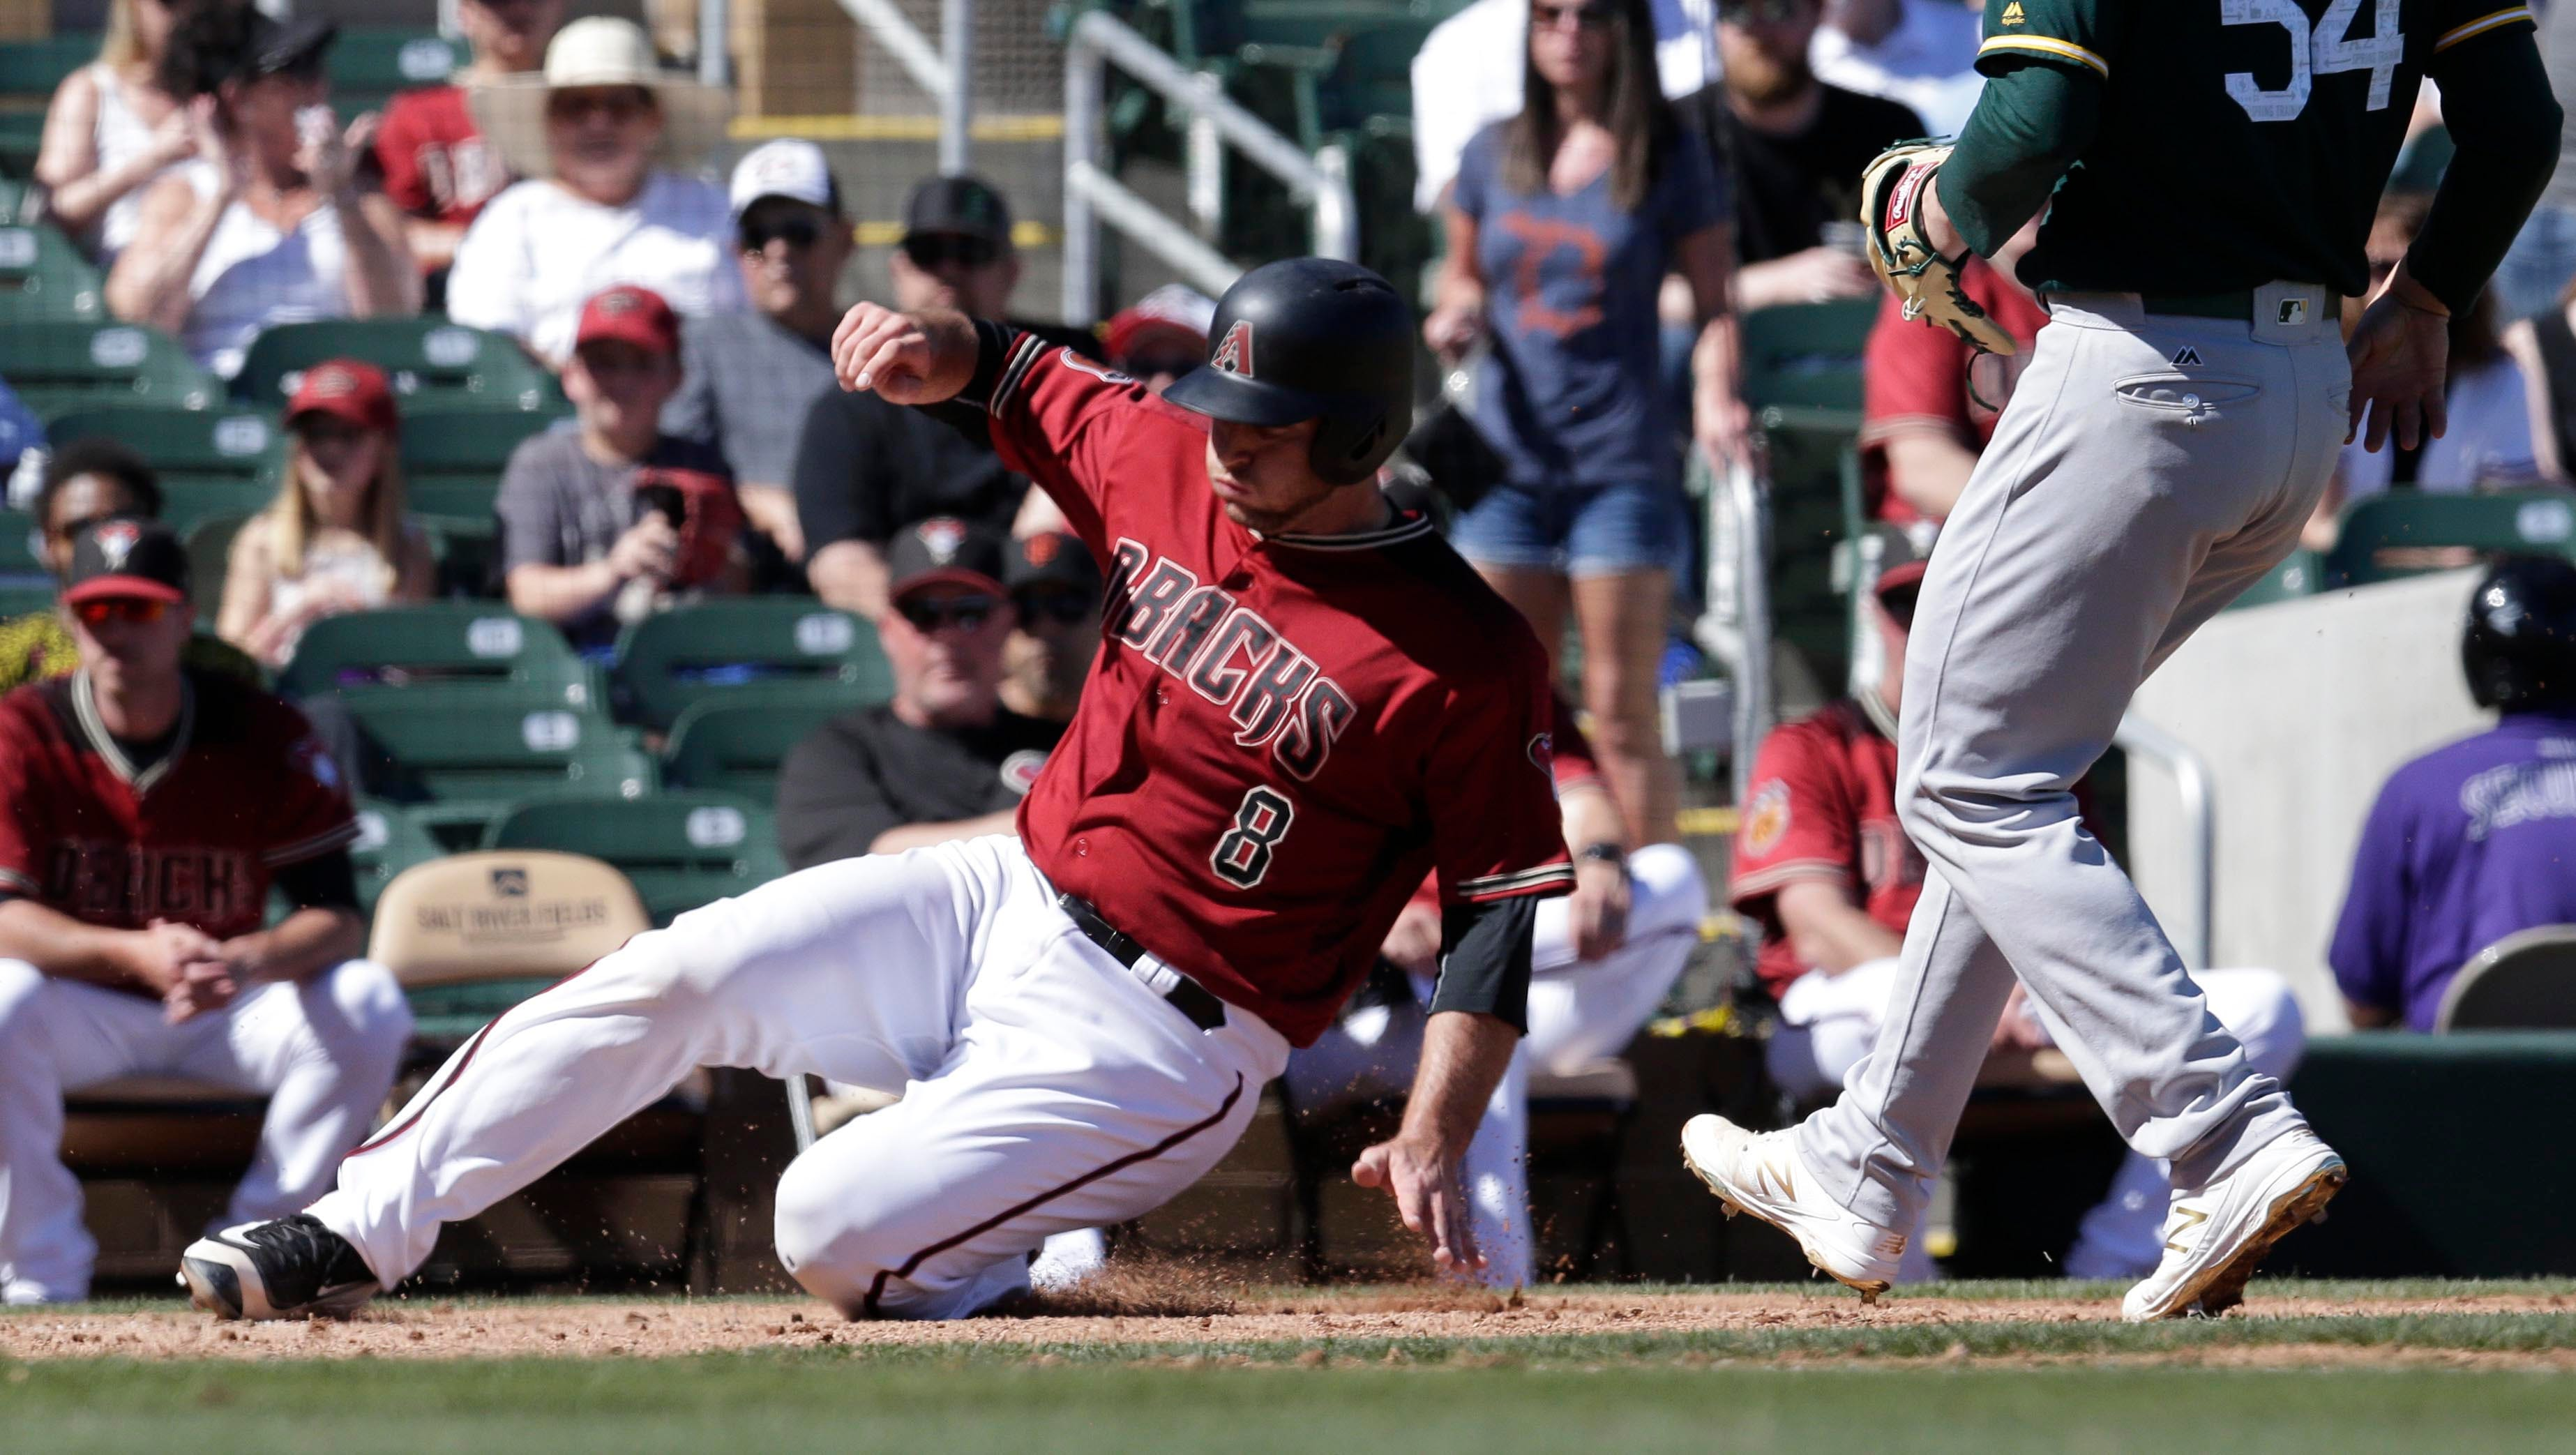 Chris Iannetta Colorado Rockies Spring Training Baseball Player Jersey